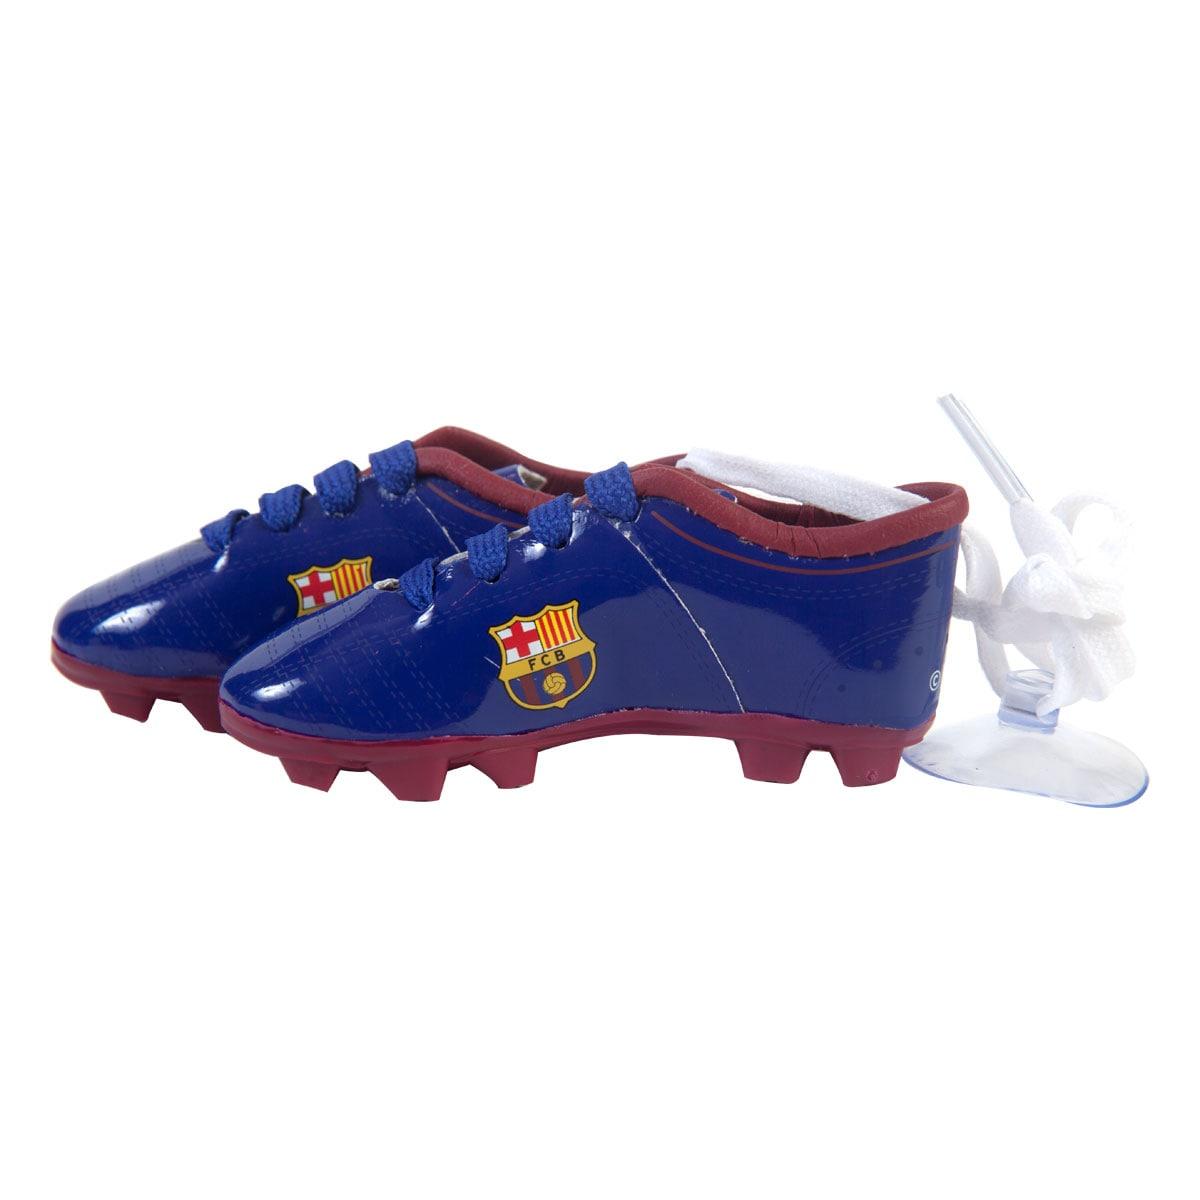 F.C. Barcelona Mini Football Boots - 1